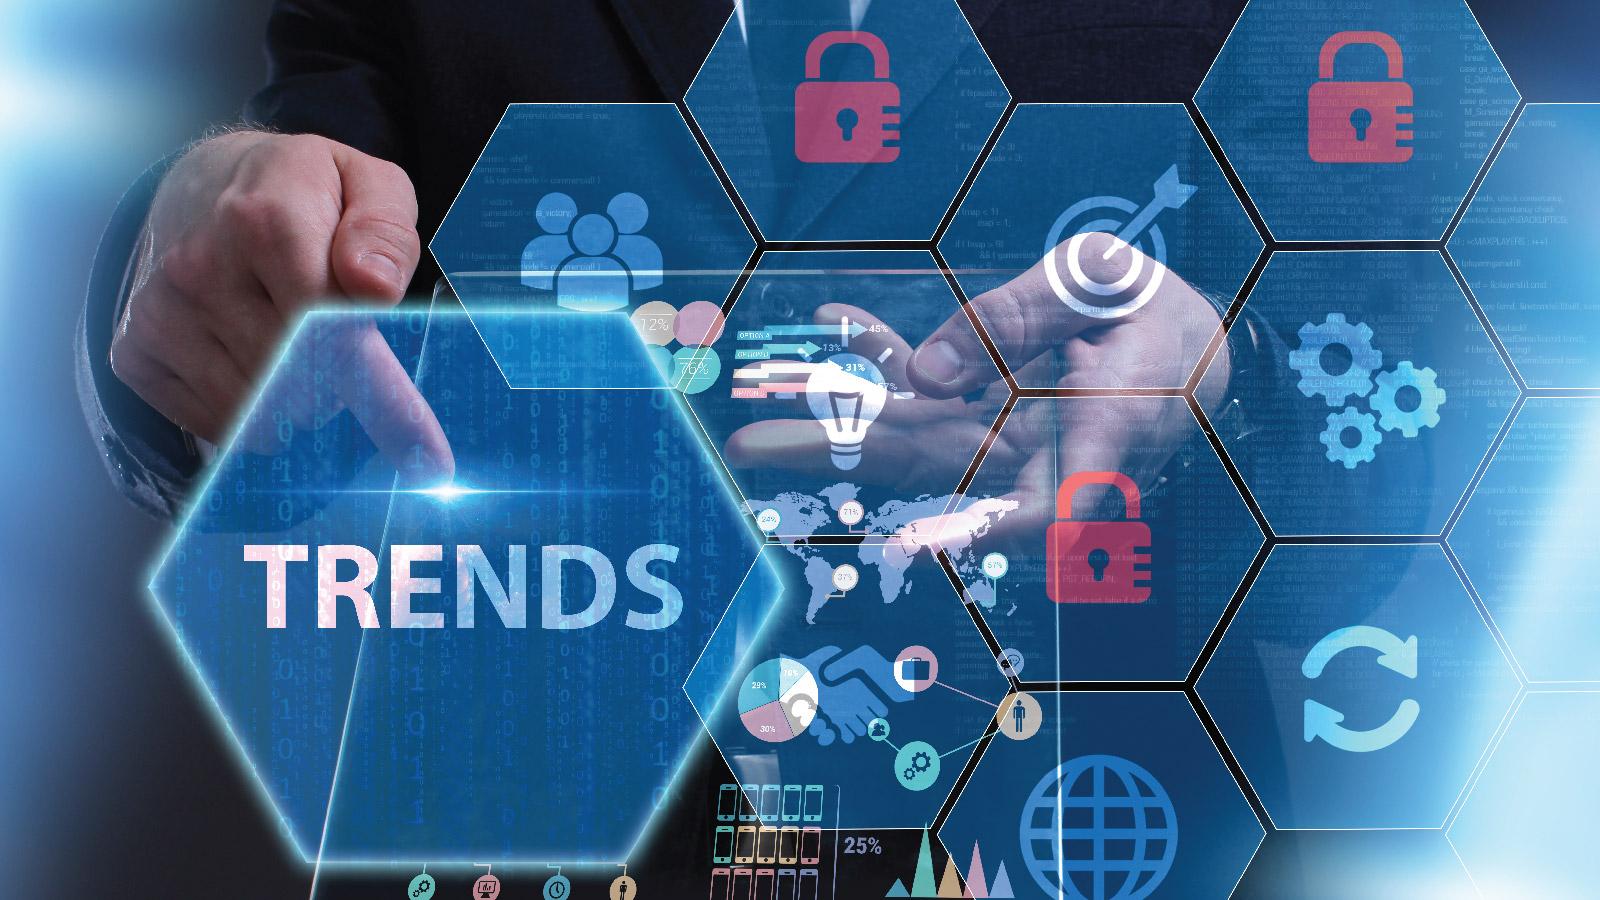 2020 Technology Trends.Five Emerging Technology Trends For 2020 Enterprisetalk